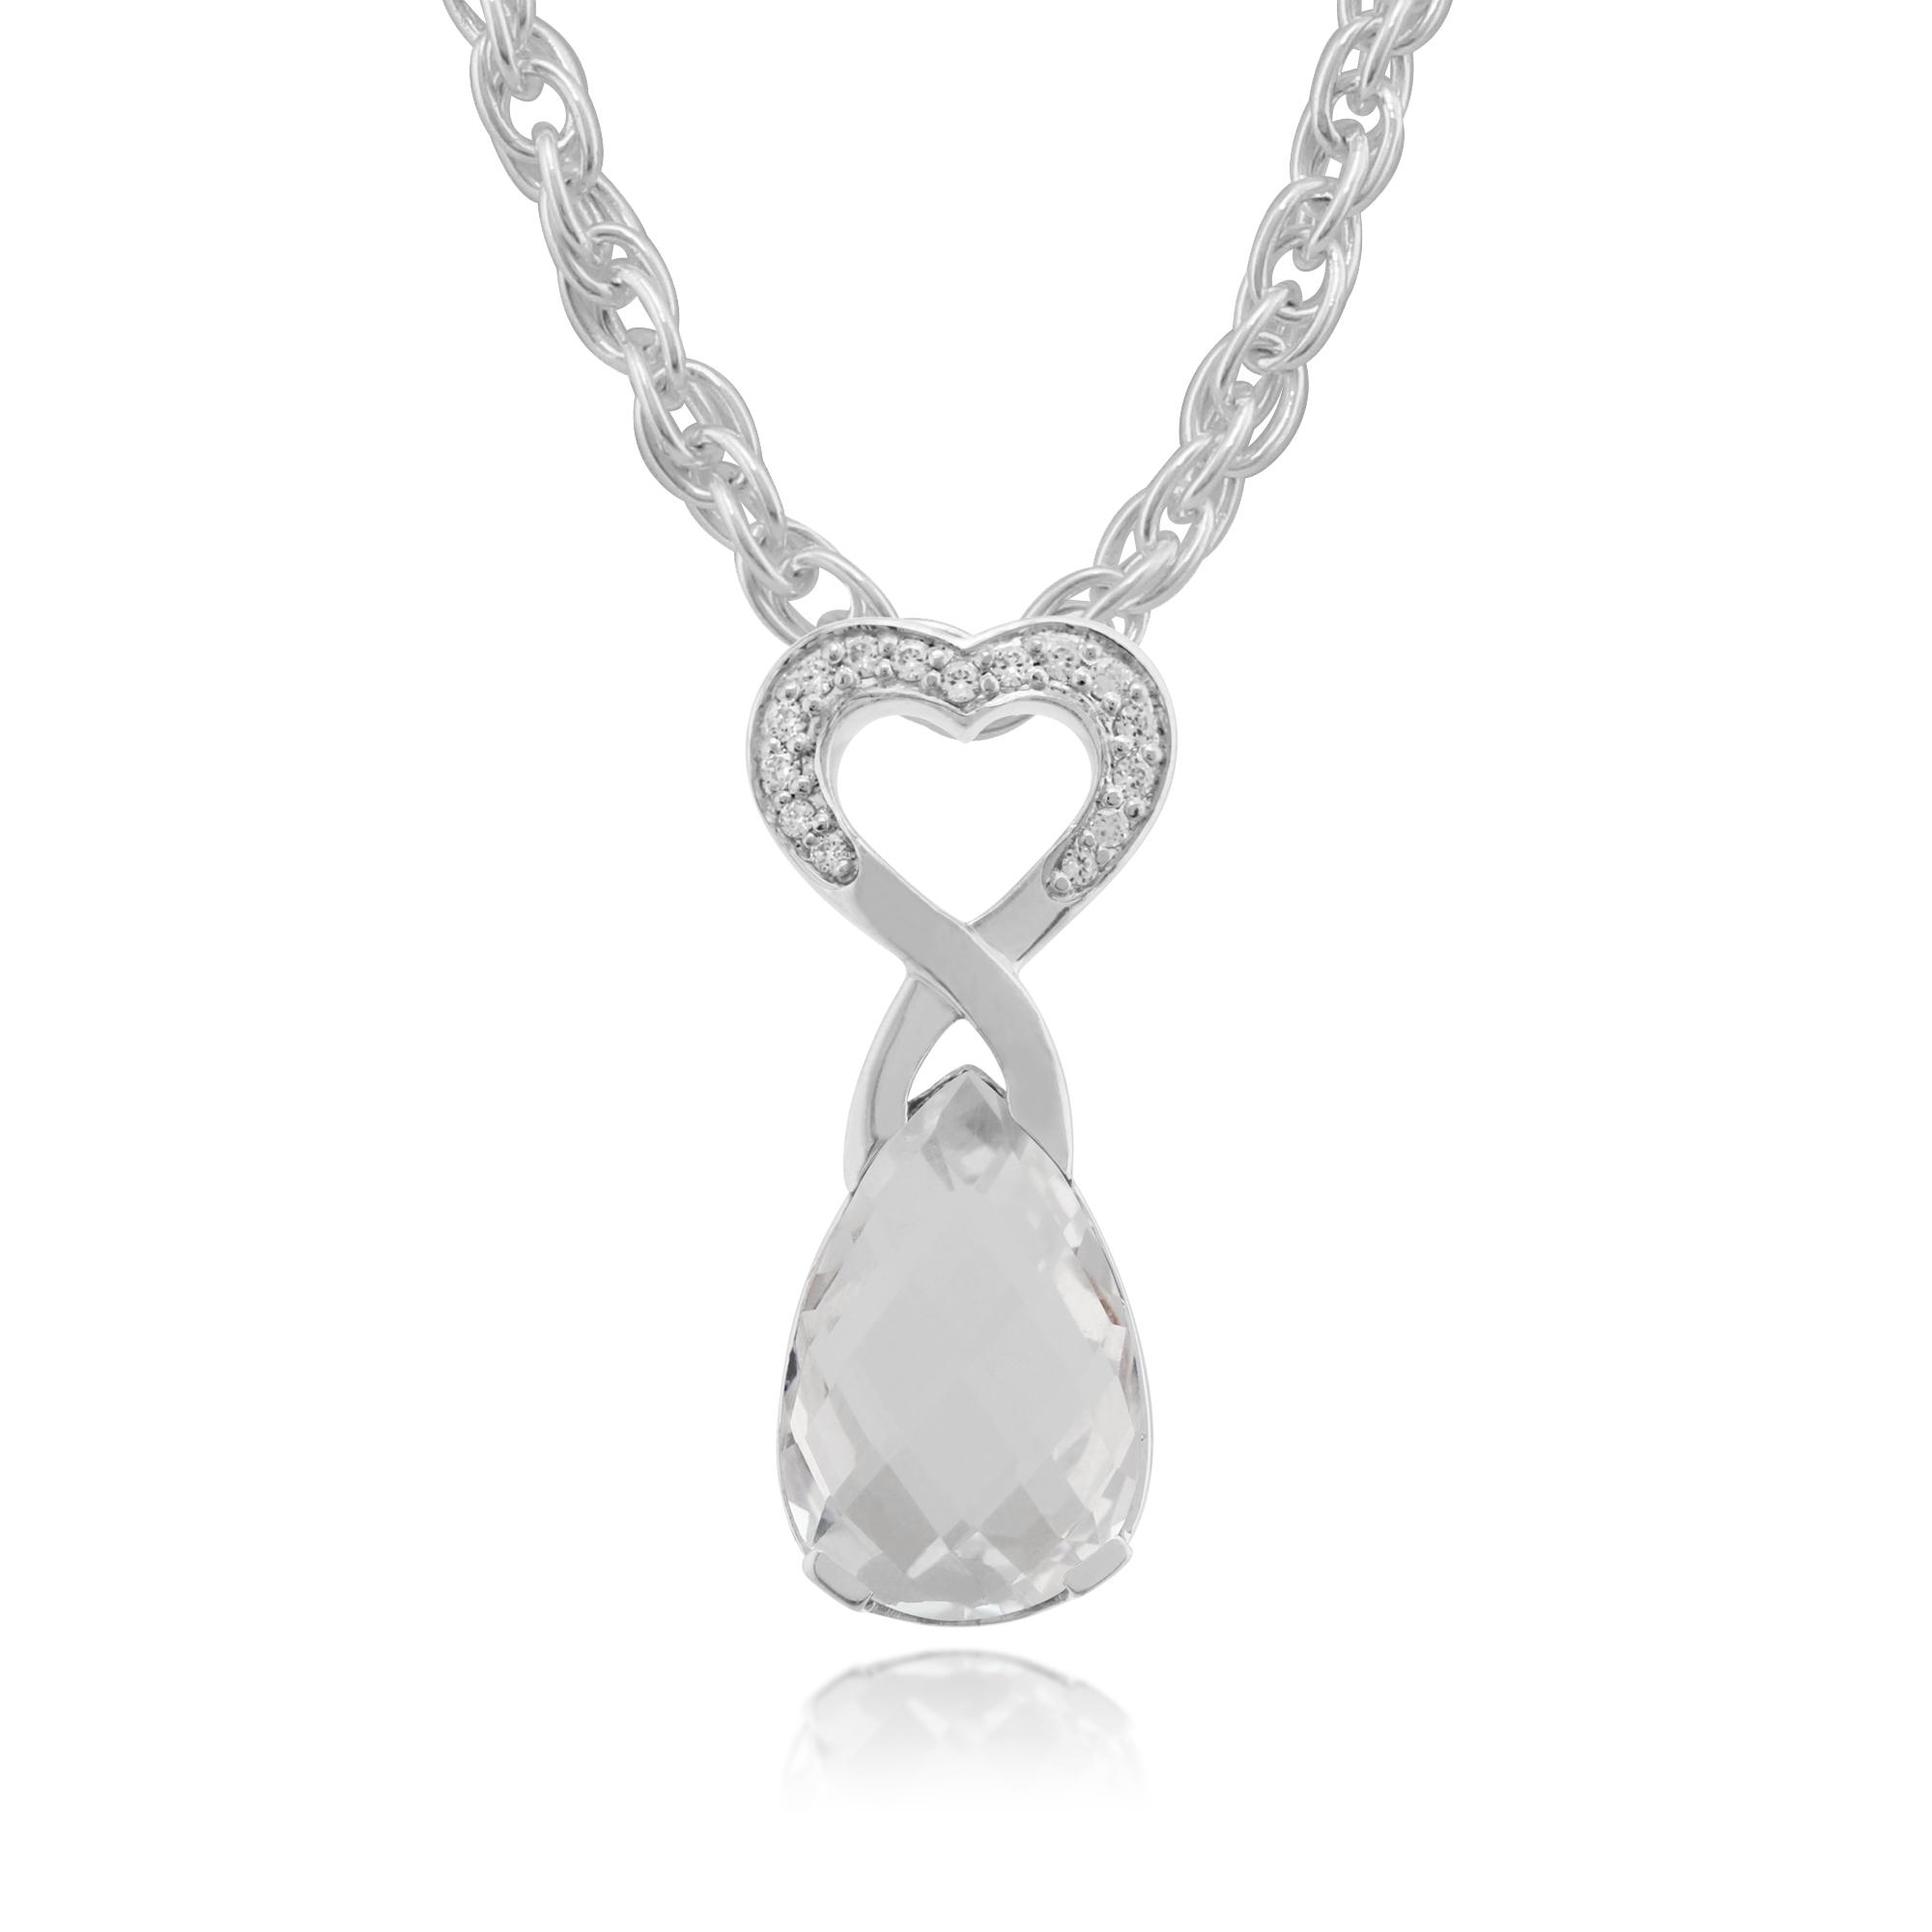 9ct White Gold 3.50ct Rock Crystal & Diamond Heart Pendant on 45cm Chain